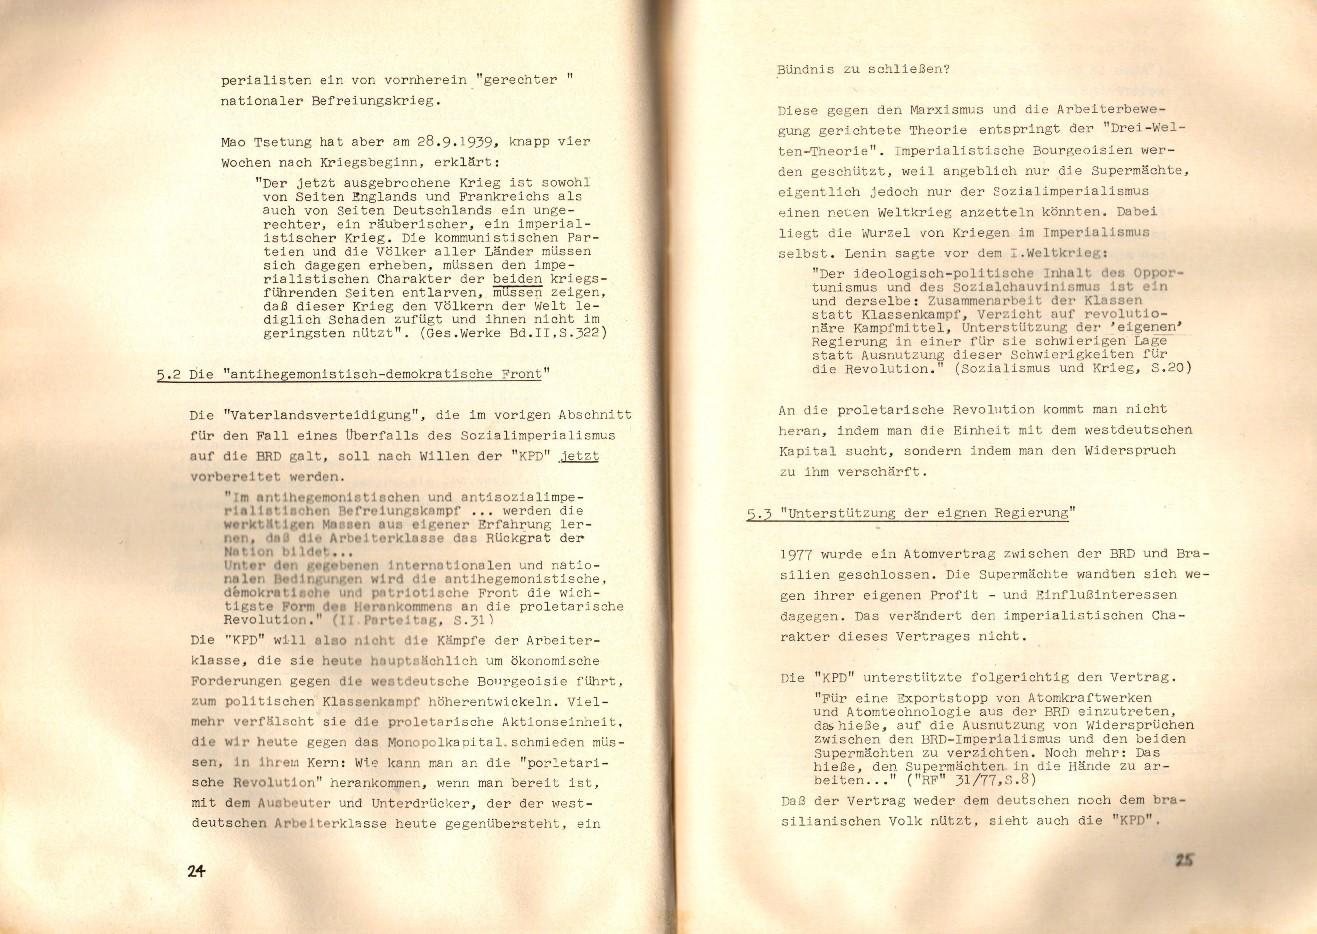 KABD_1978_Argumentationshilfen_14